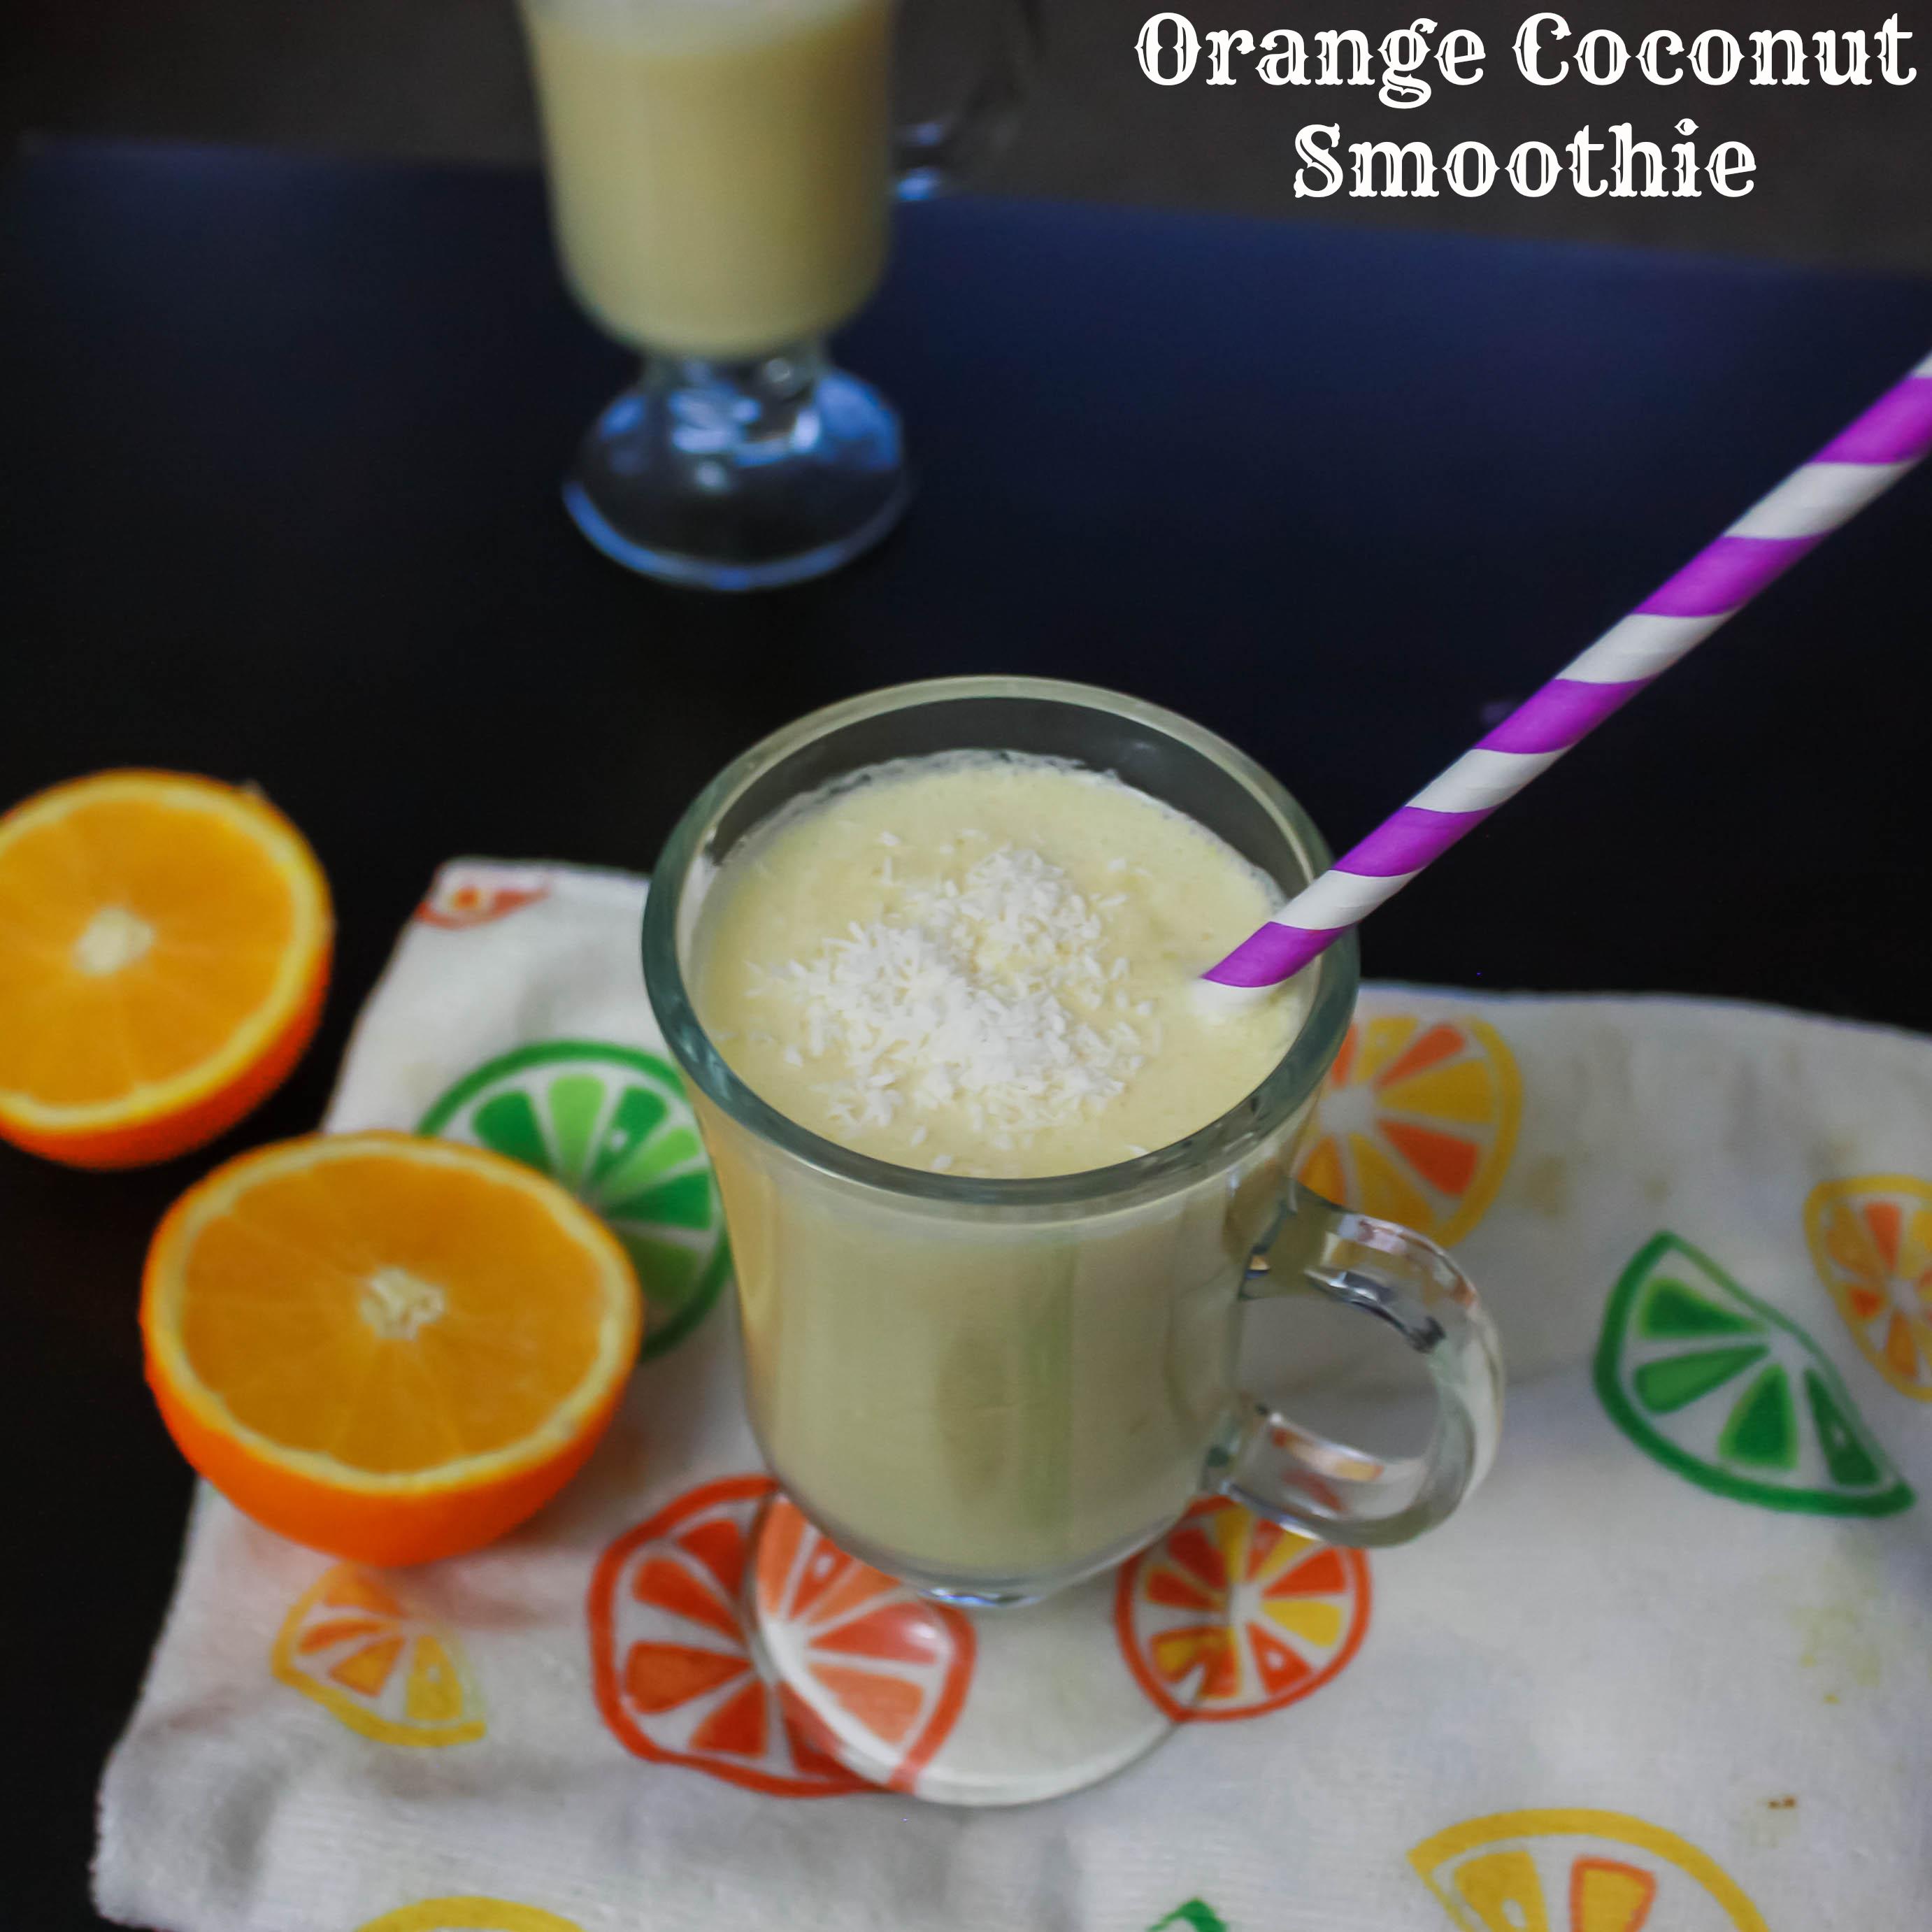 Orange Coconut_Smoothie_1pic_Relishthebite-2-2